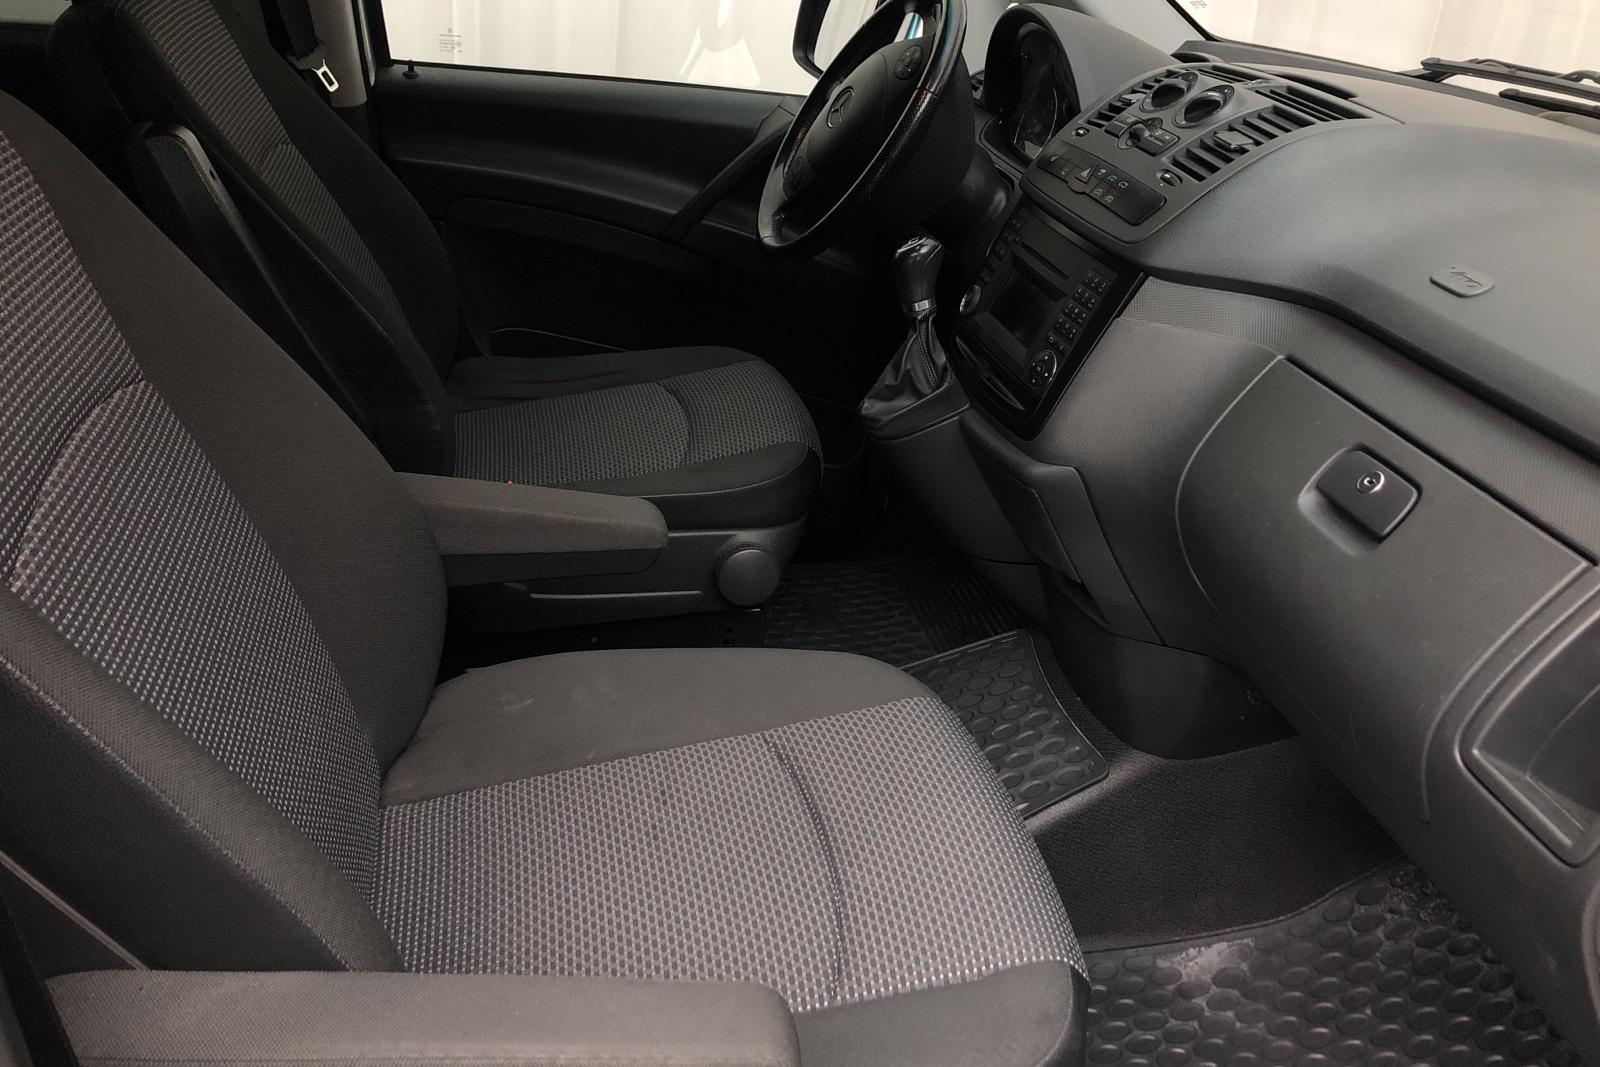 Mercedes Vito 122 CDI W639 (224hk) - 12 800 mil - Automat - silver - 2012